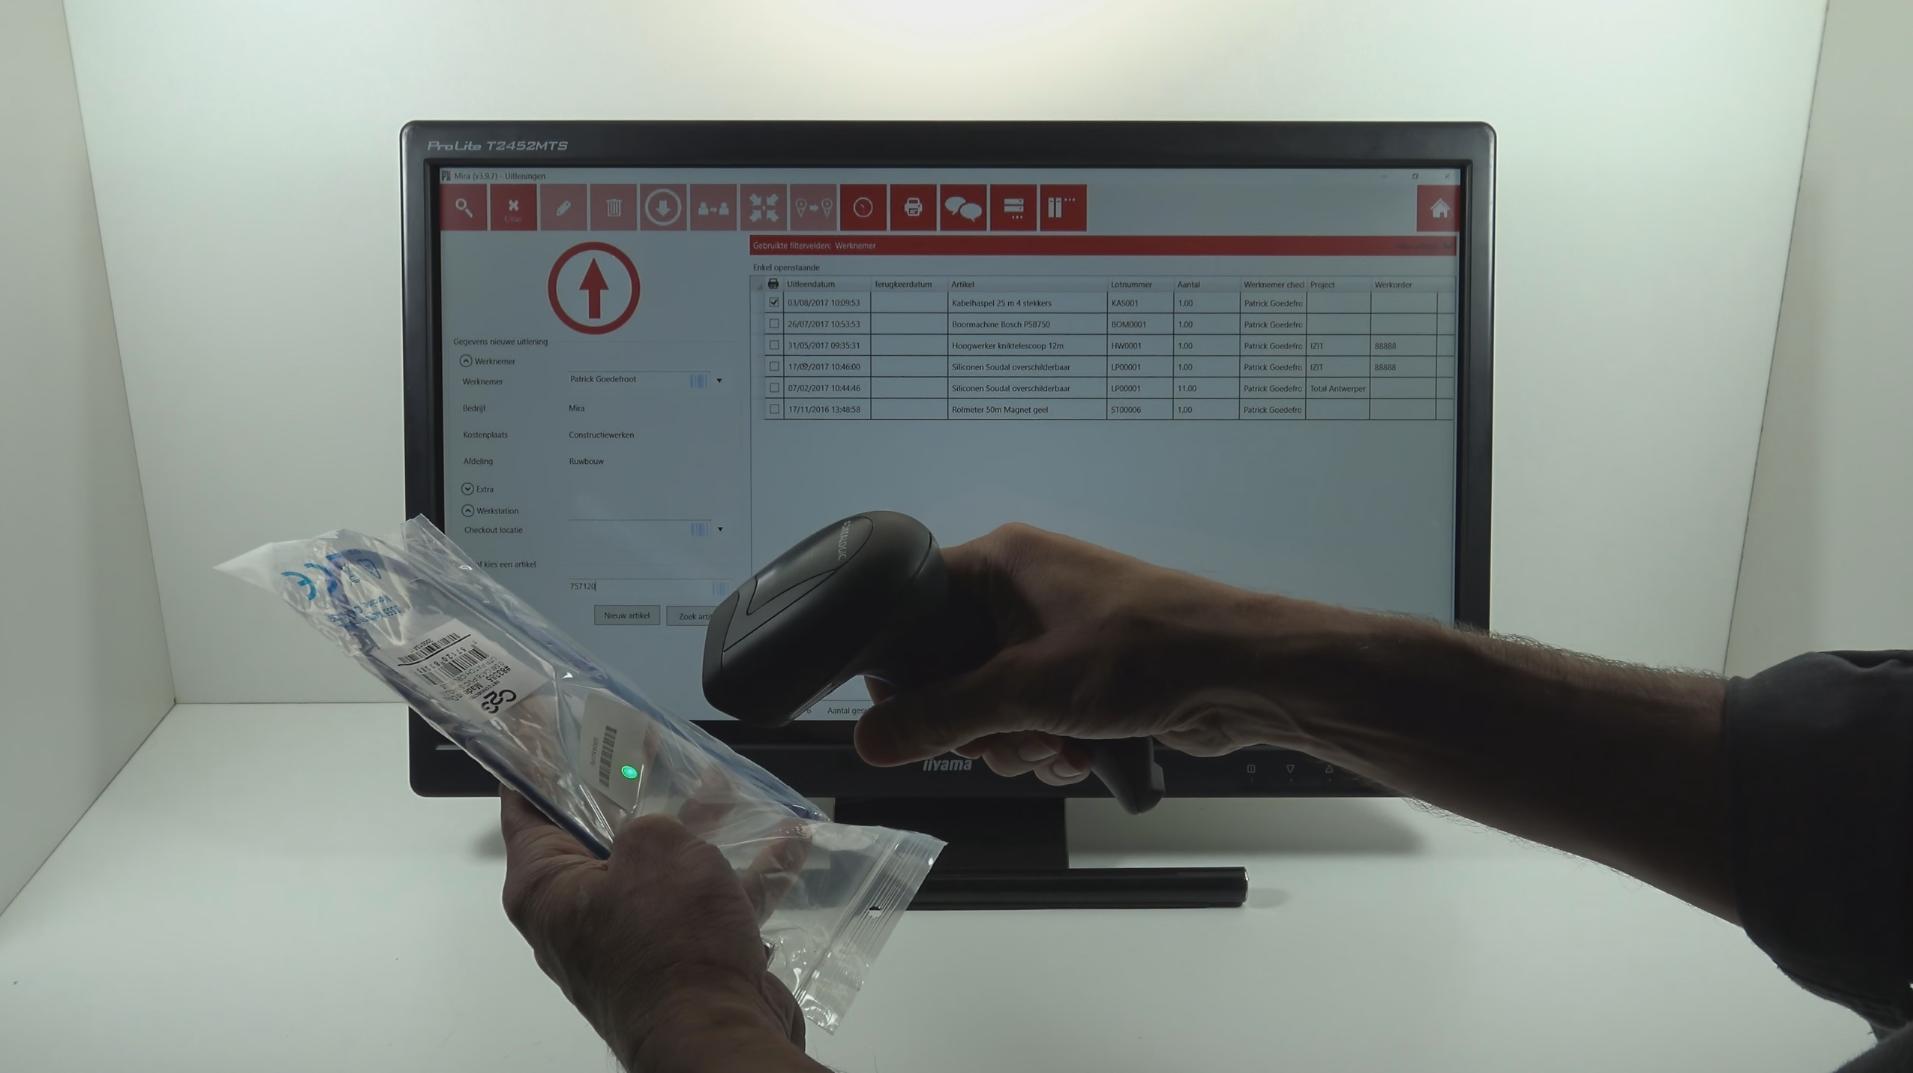 material management via scanning